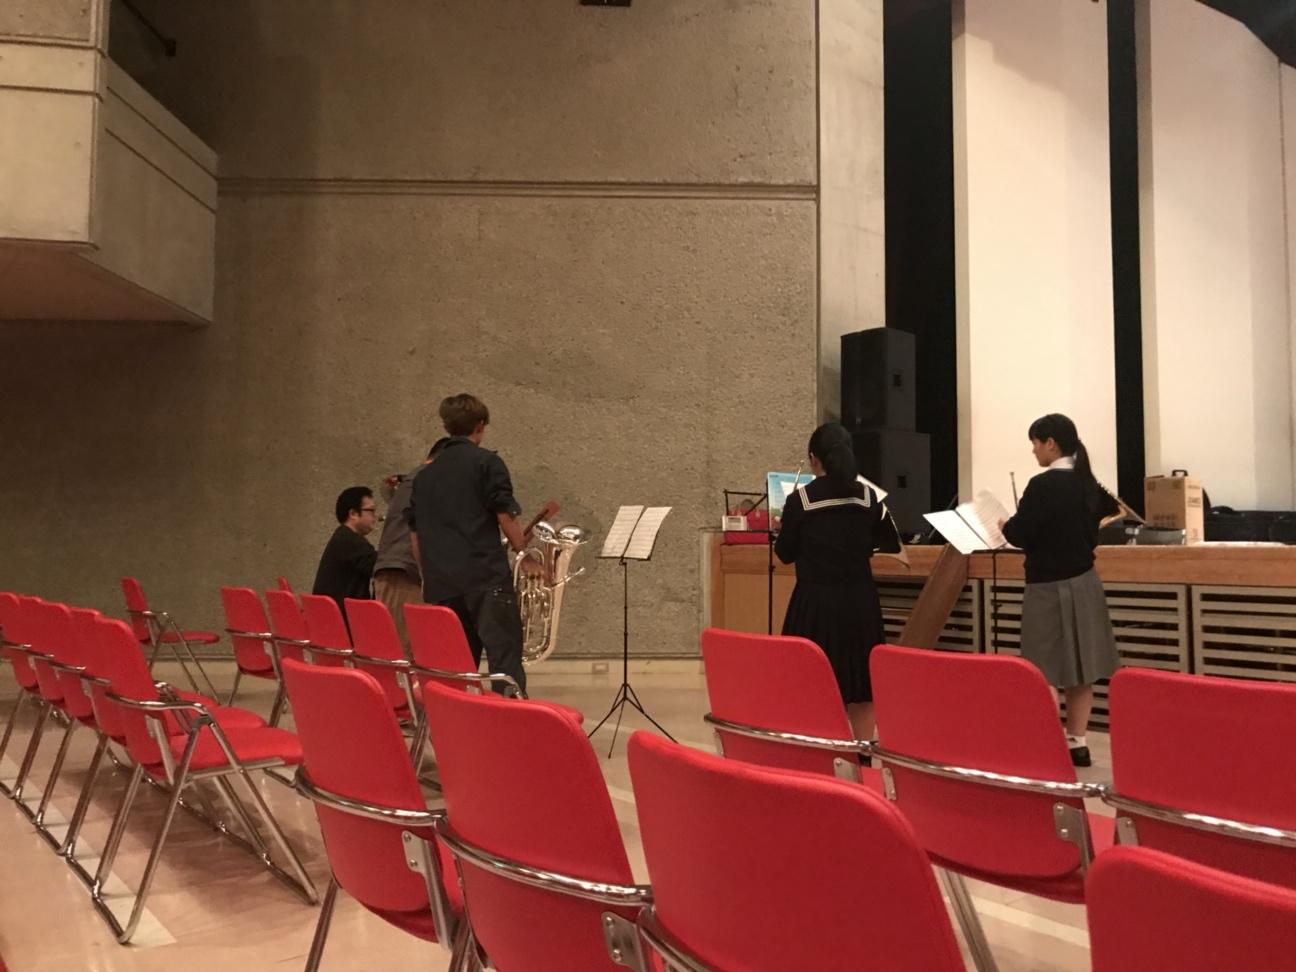 熊野吹奏楽団 広島 市民バンド 吹奏楽団